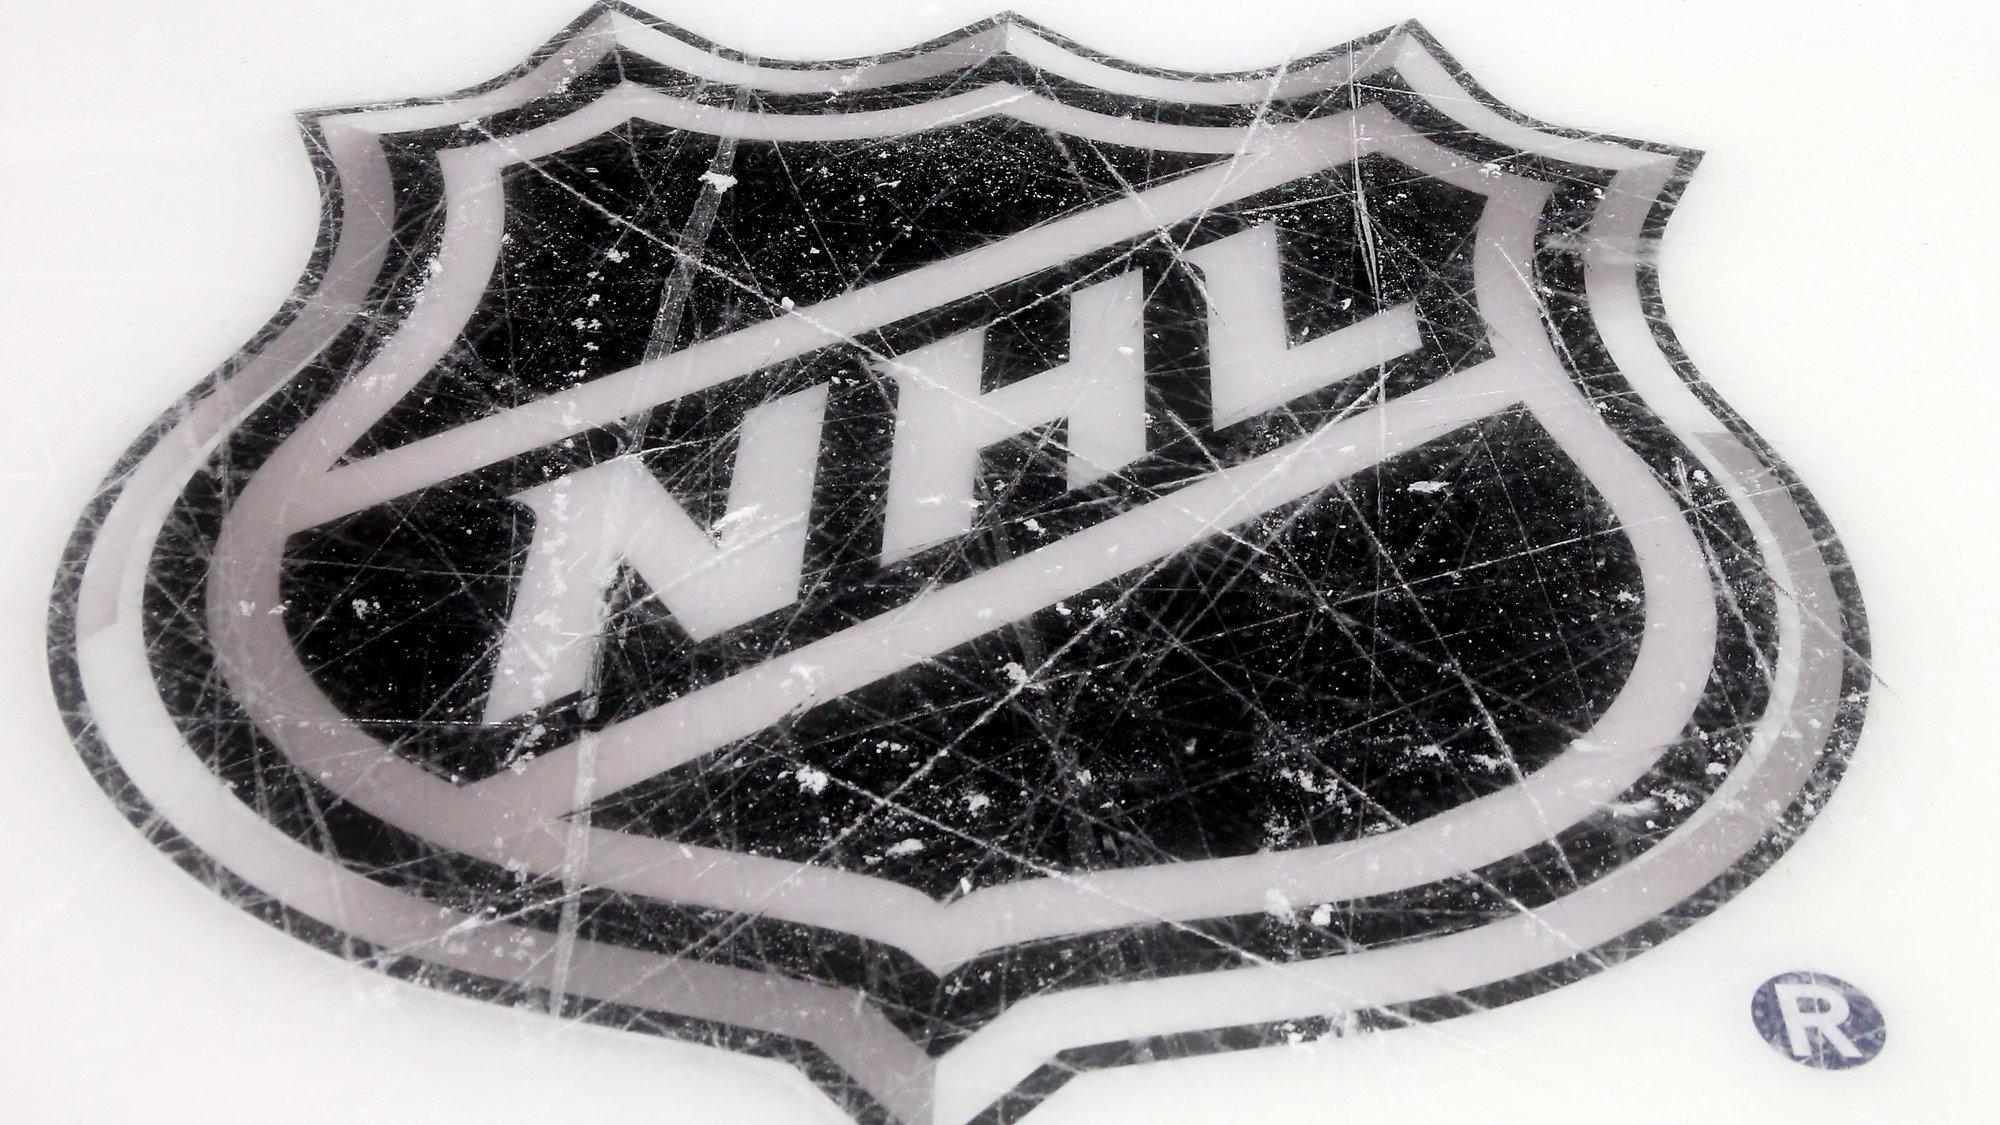 https://hockey.by/upload/iblock/dfa/dfa3fa0a60cbe305d359508d3b975578.jpg